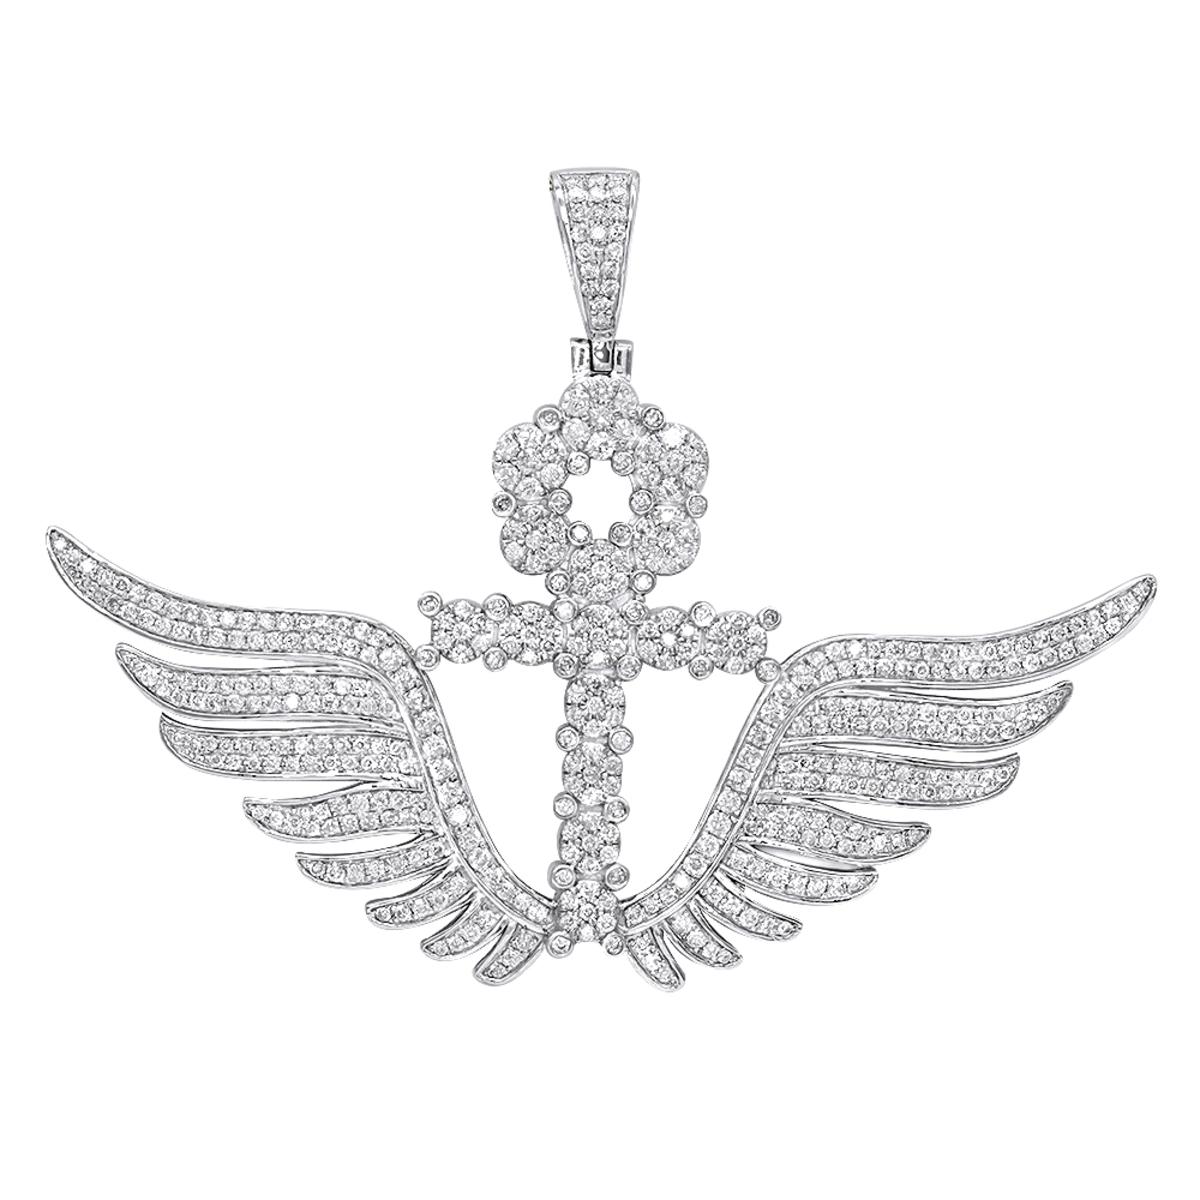 10K Gold Mens Diamond Ankh Pendant Cross with Wings 3.33ct by Luxurman